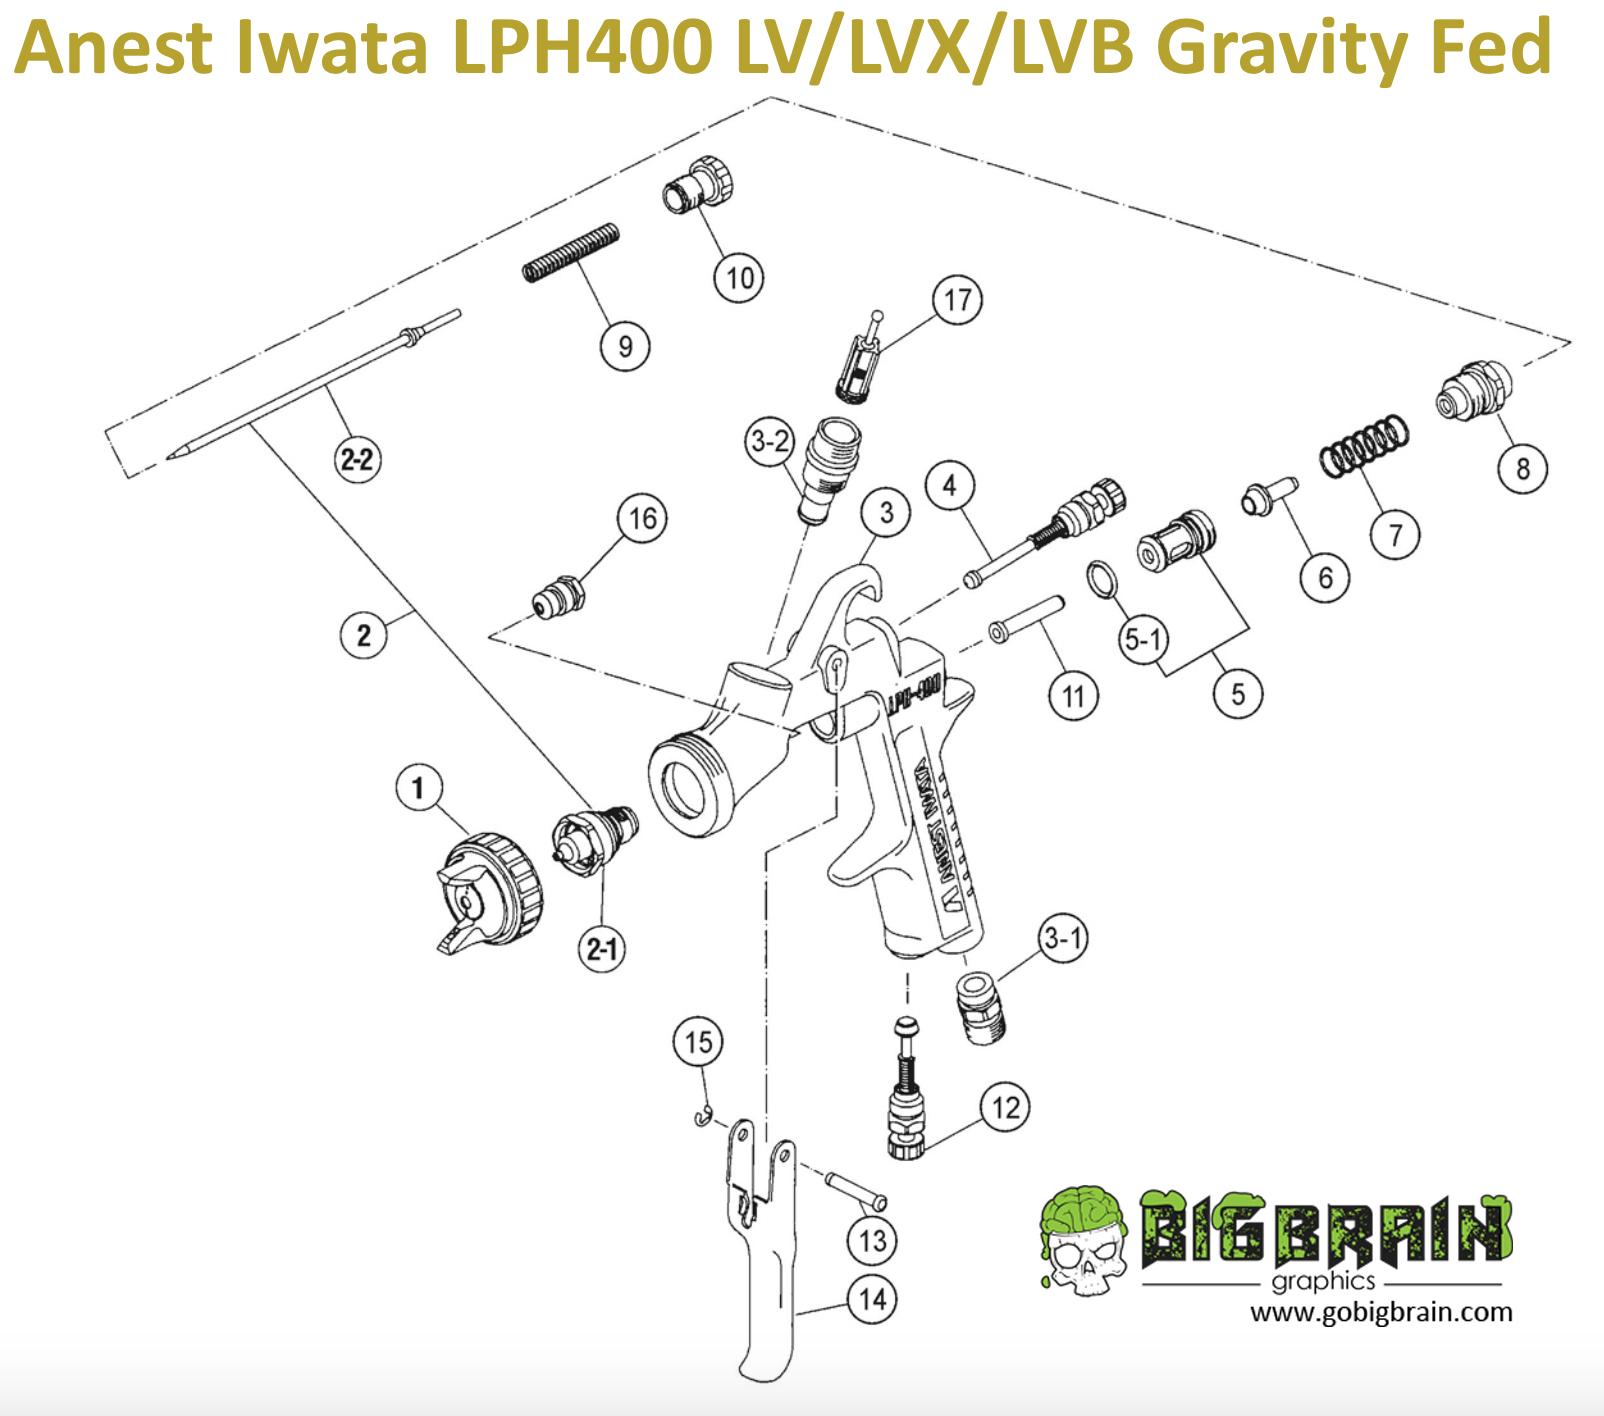 parts-diagram-lph400-lv-lvb-lvx-gun-parts-list.jpg